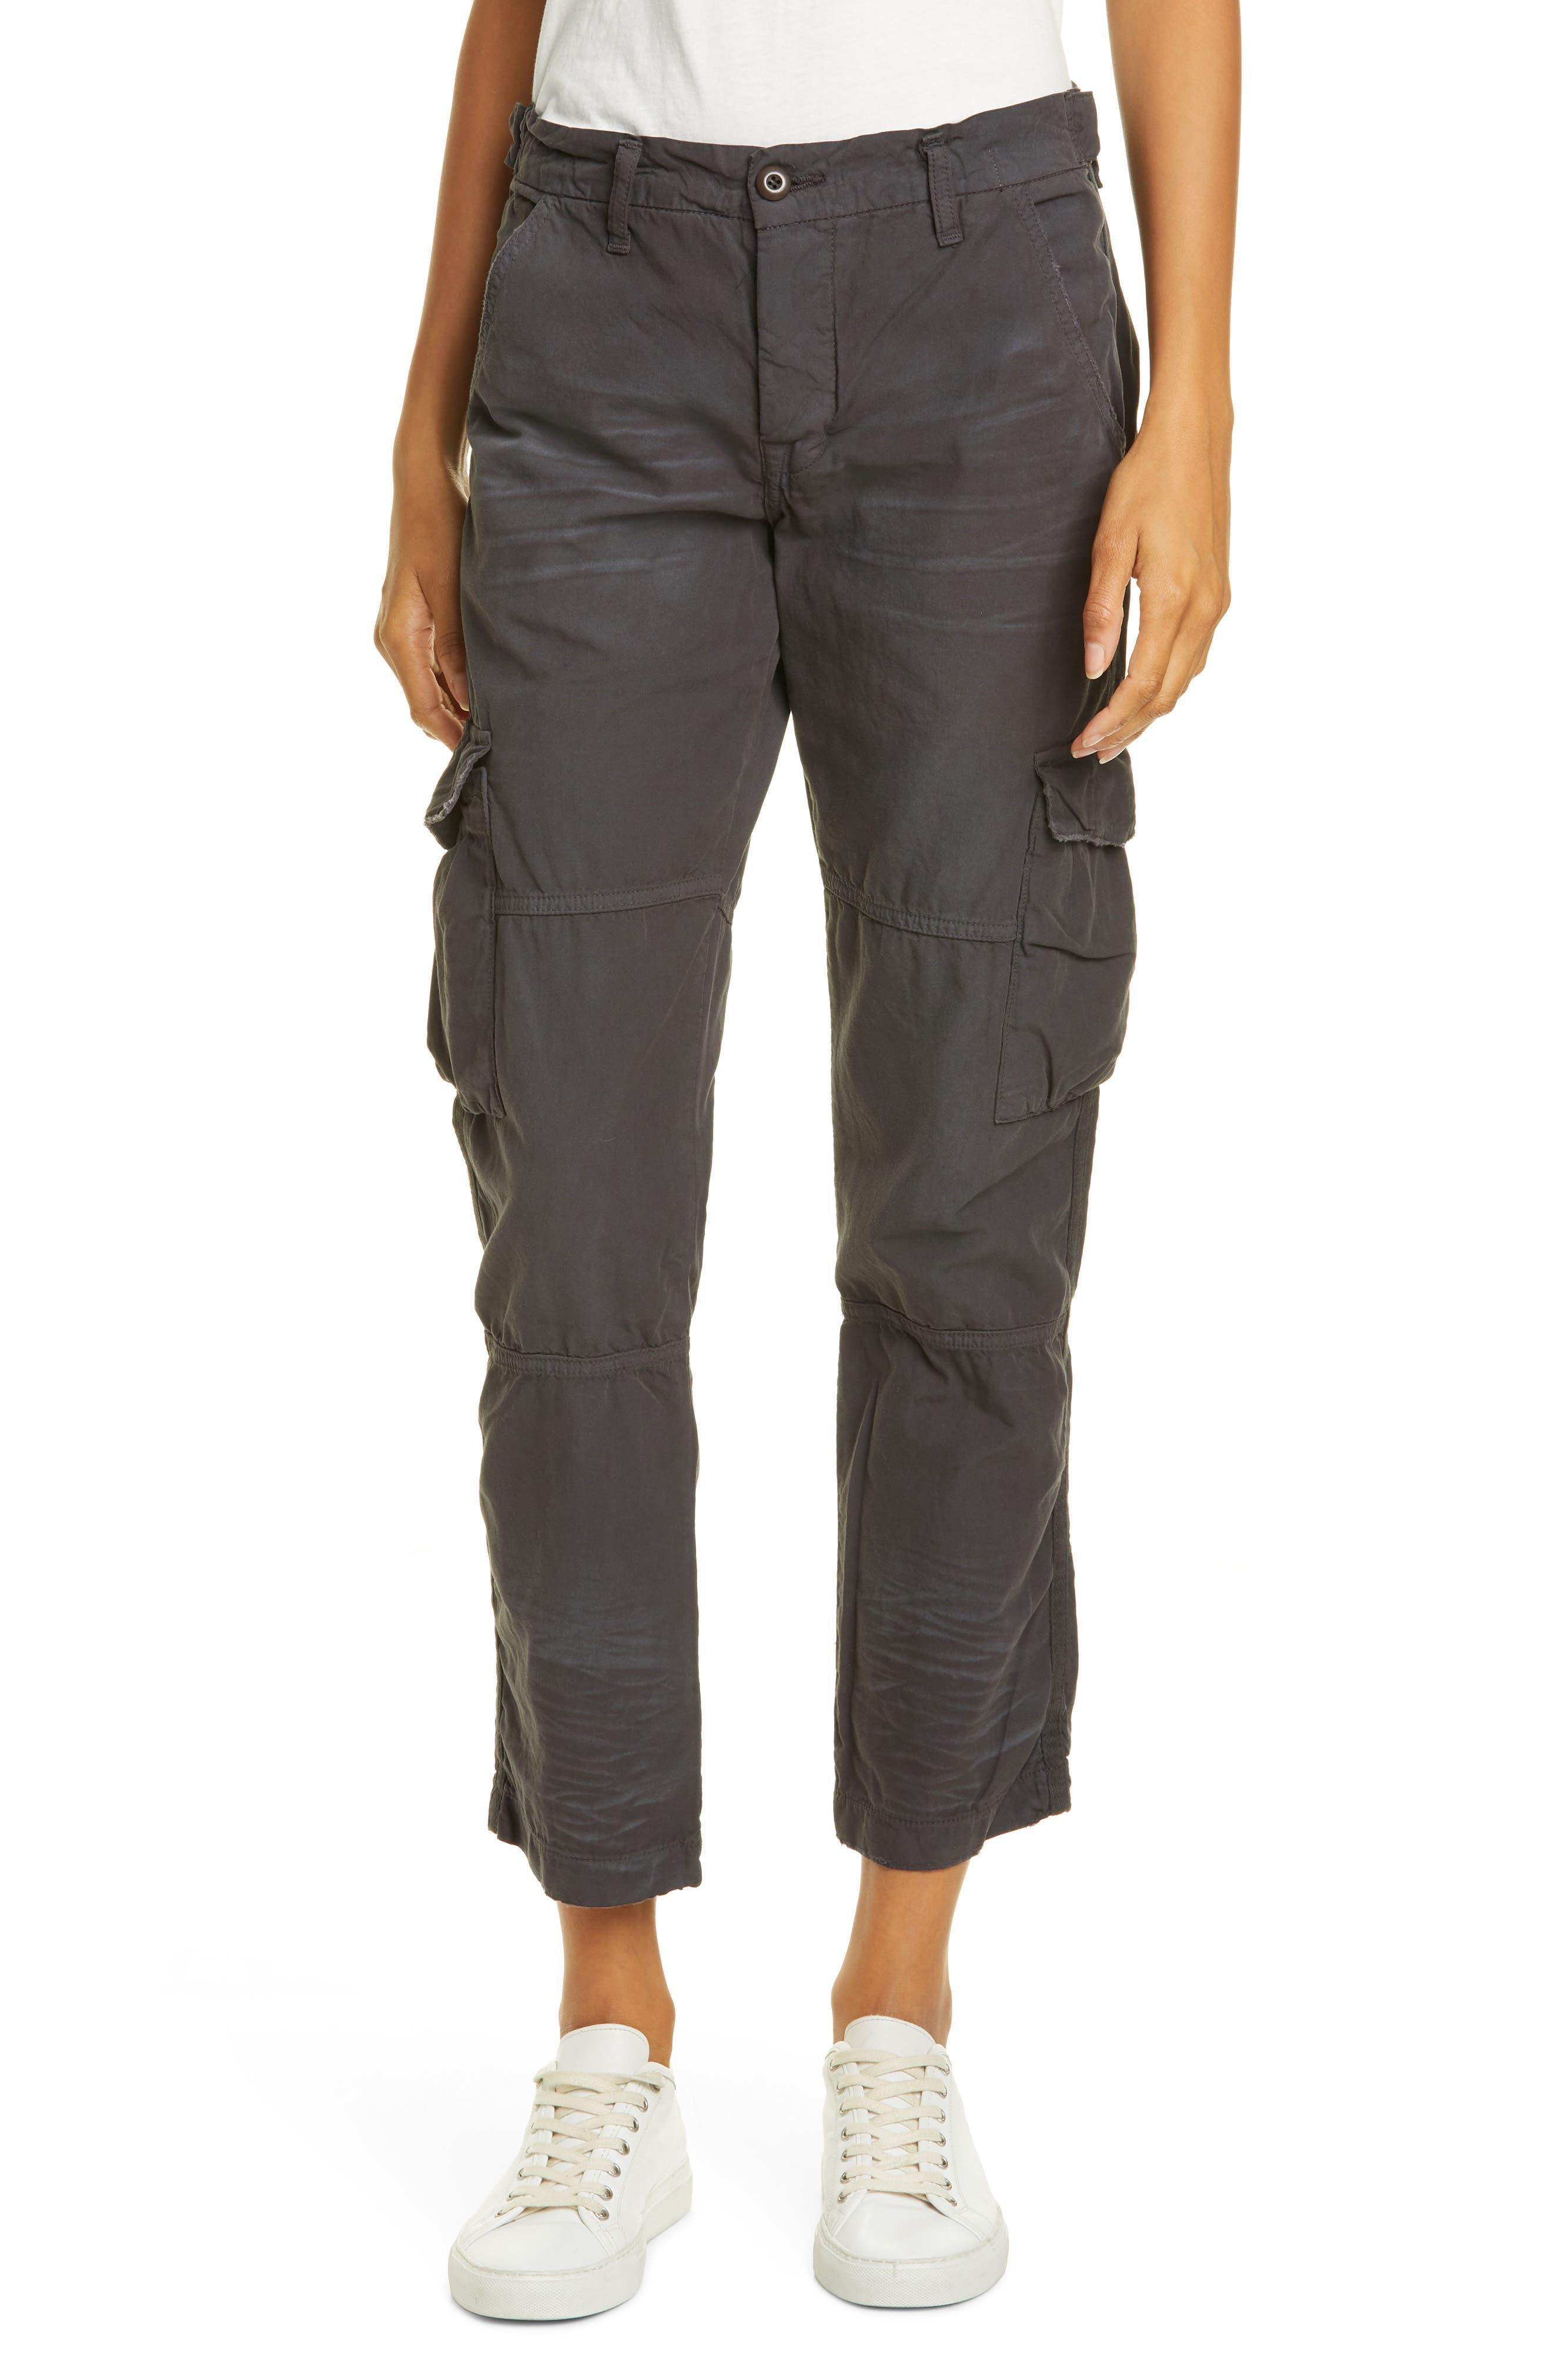 Nsf Clothing Basquiat Cargo Pants, Black